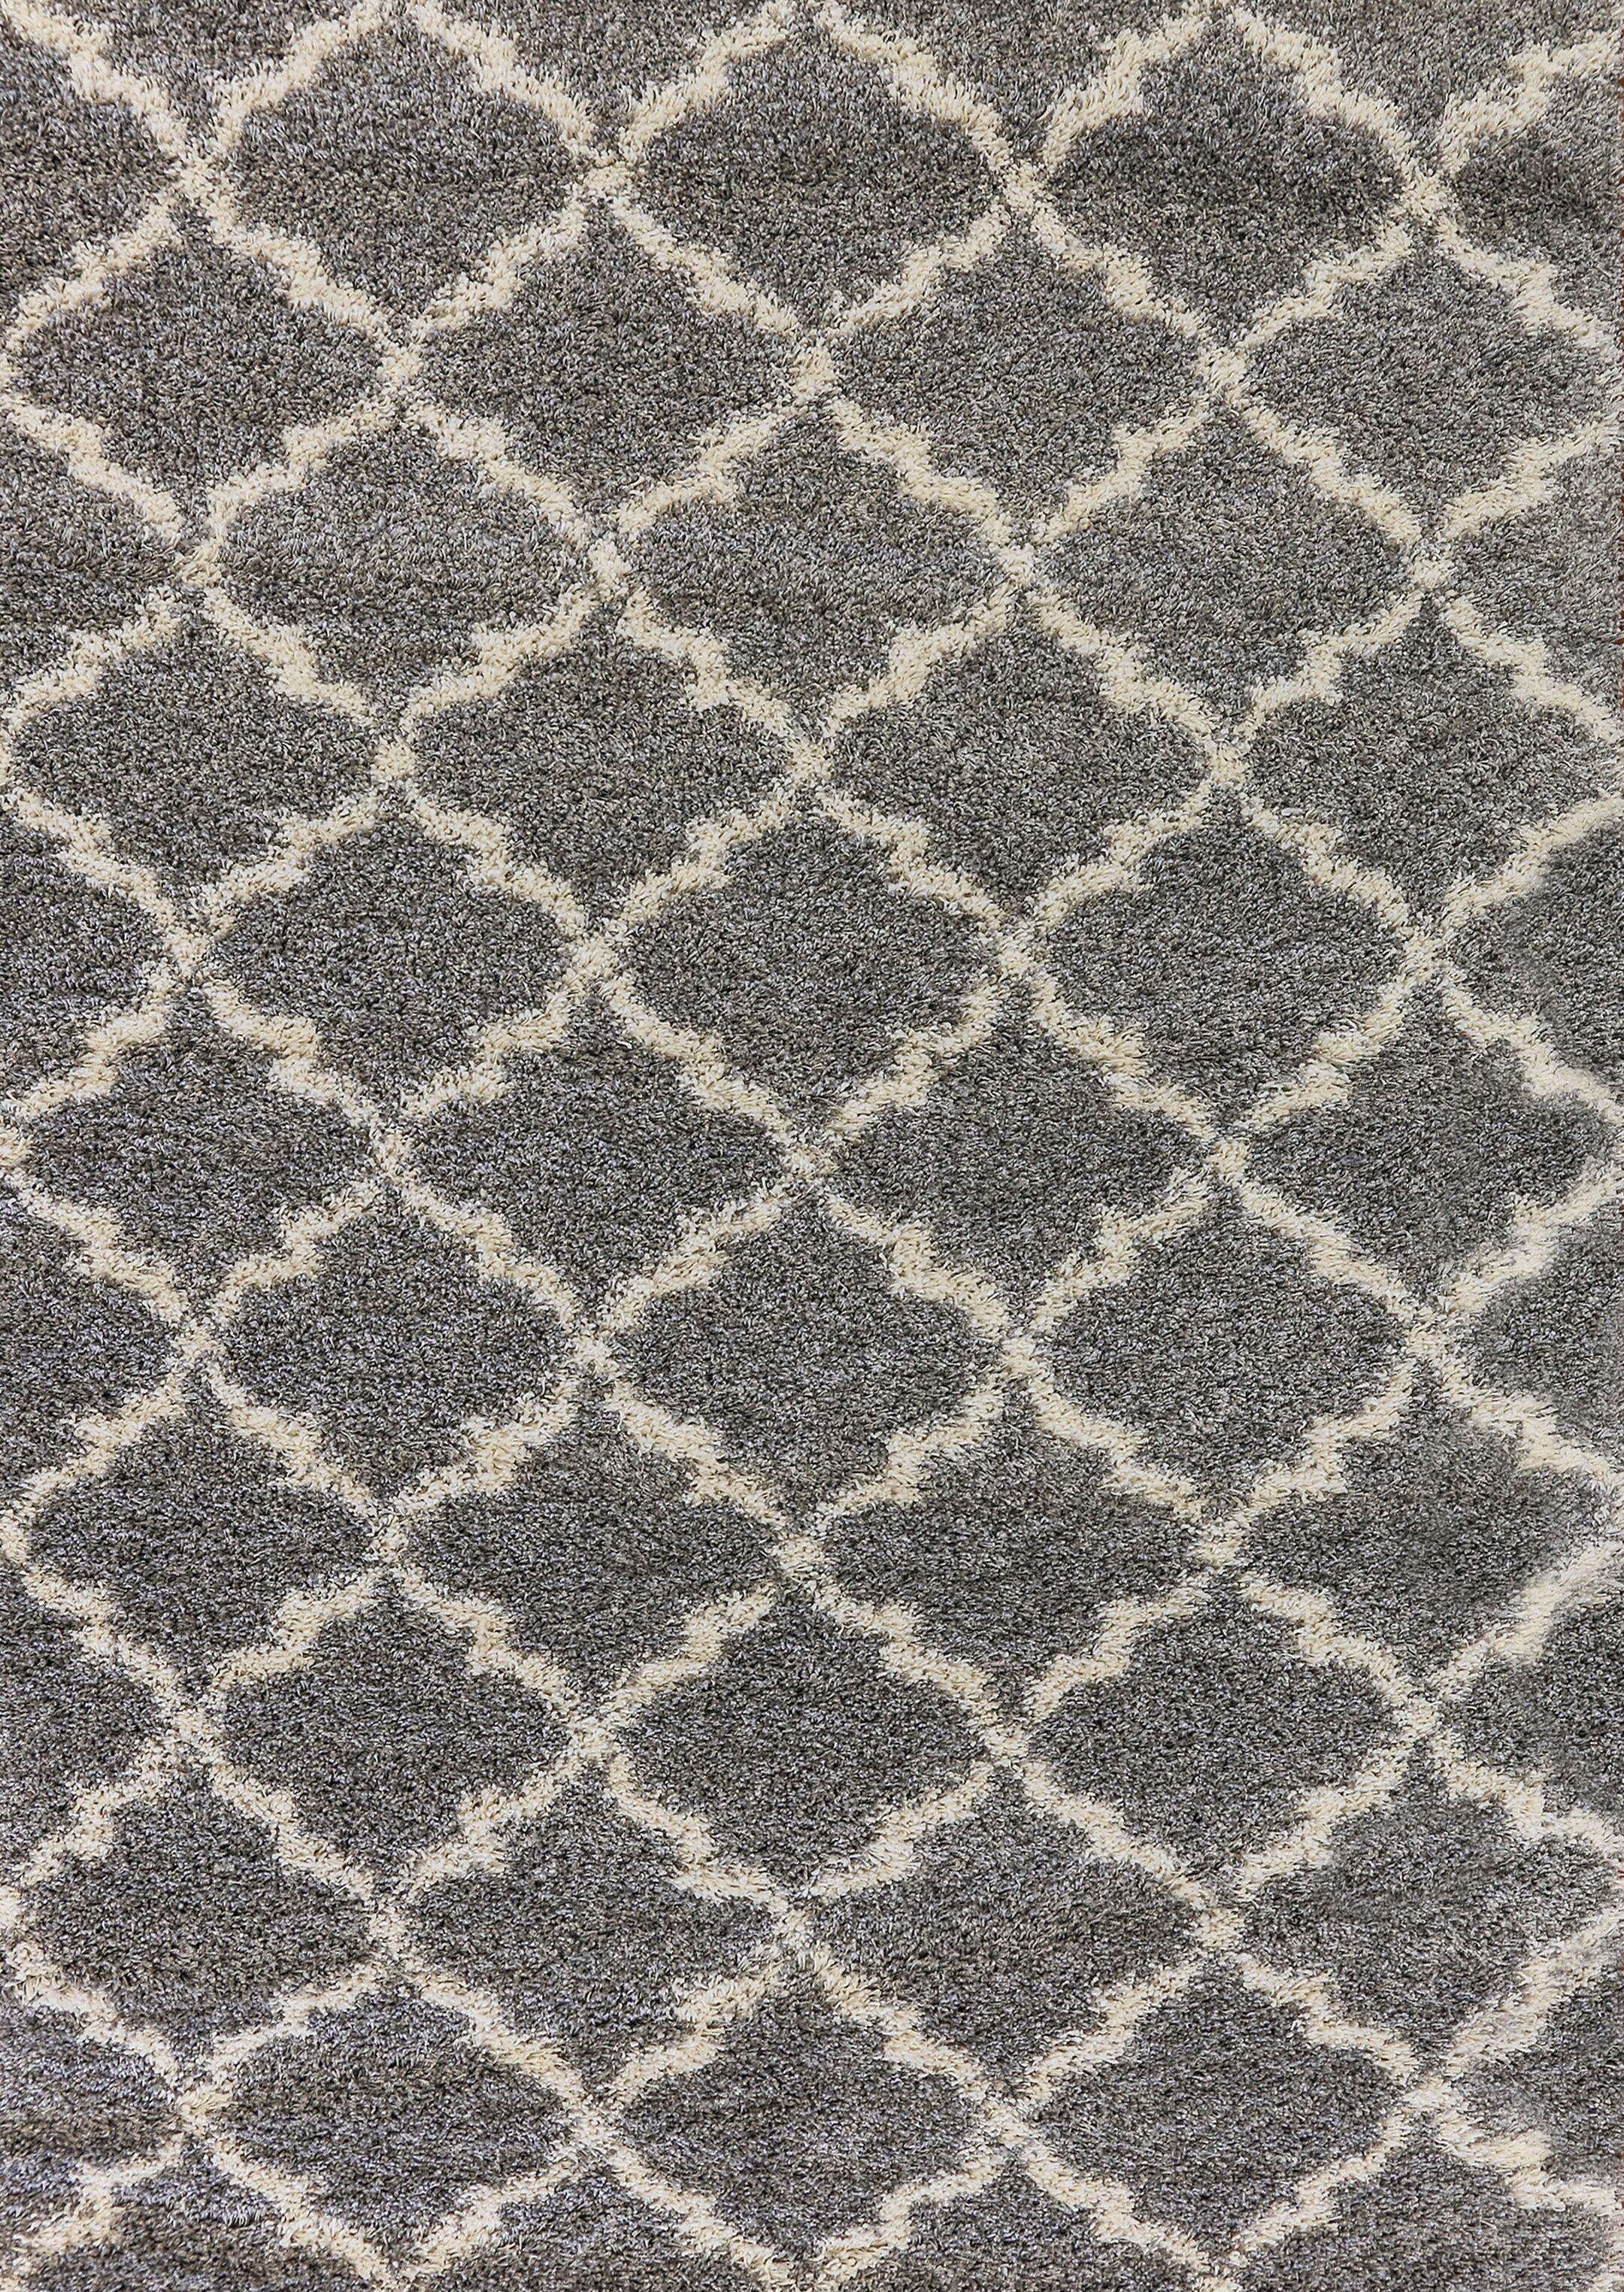 Rieder Gray/Cream Area Rug Rug Size: Rectangle 9'2